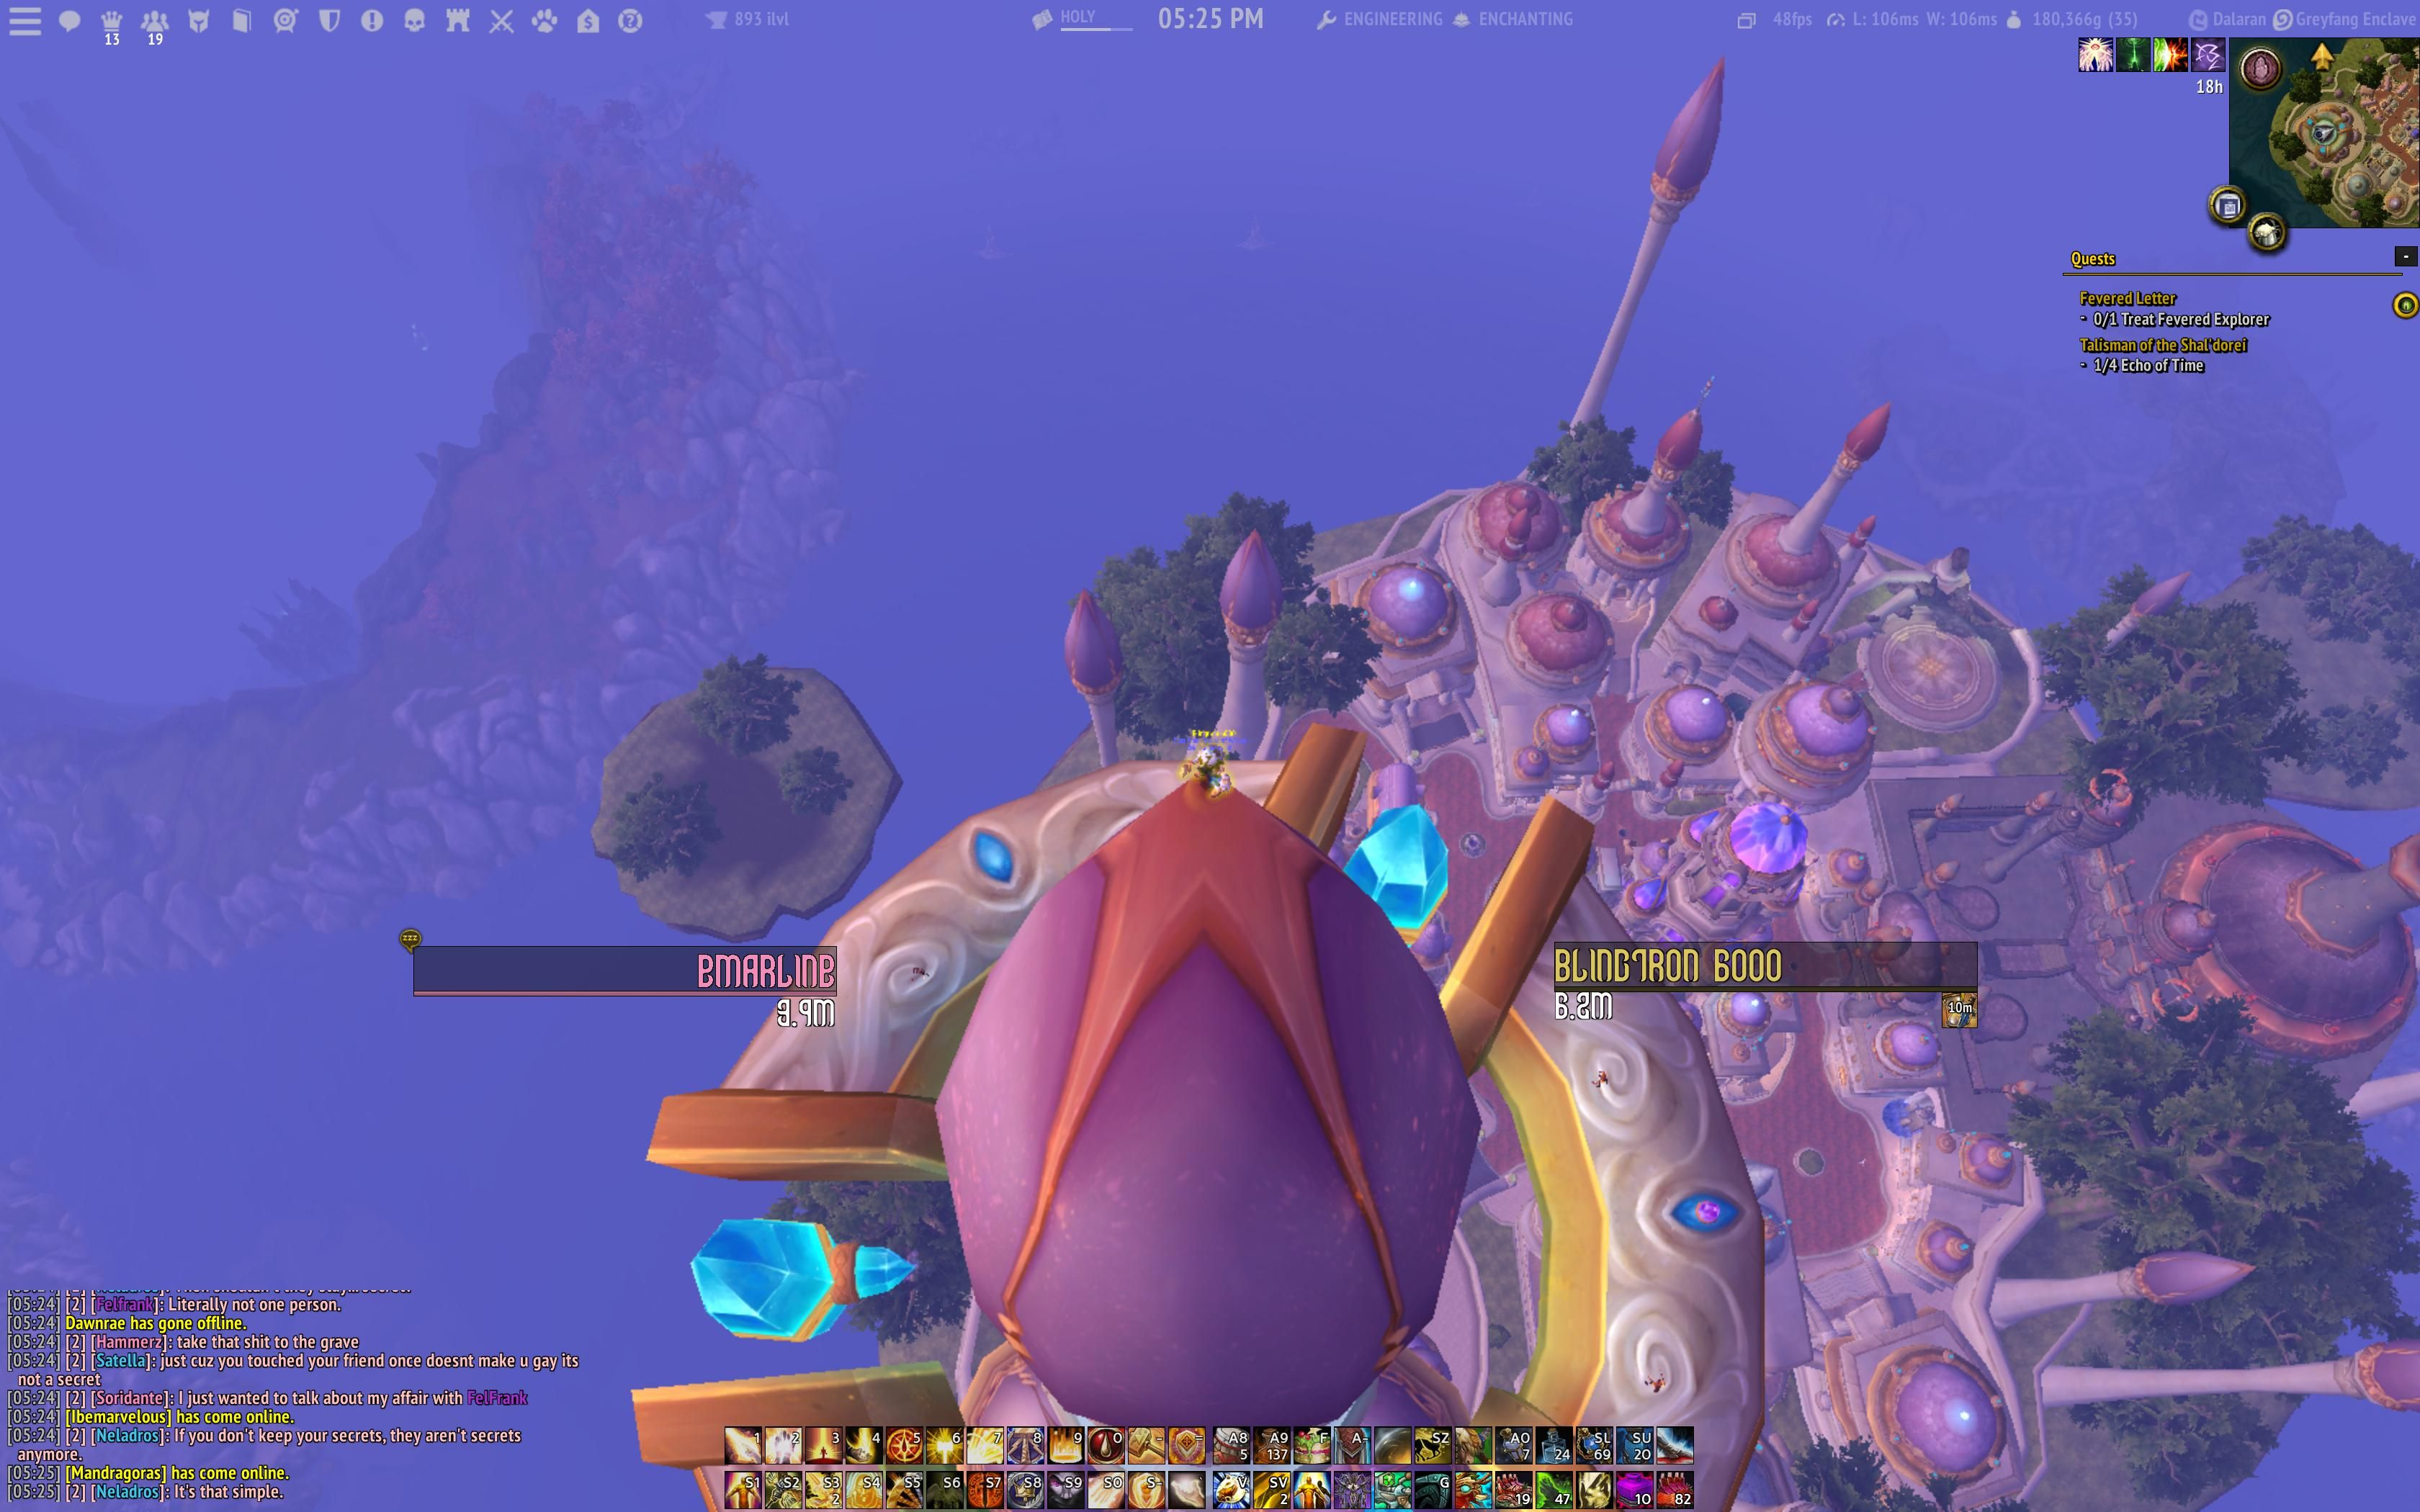 Fun with flying #worldofwarcraft #blizzard #Hearthstone #wow #Warcraft #BlizzardCS #gaming